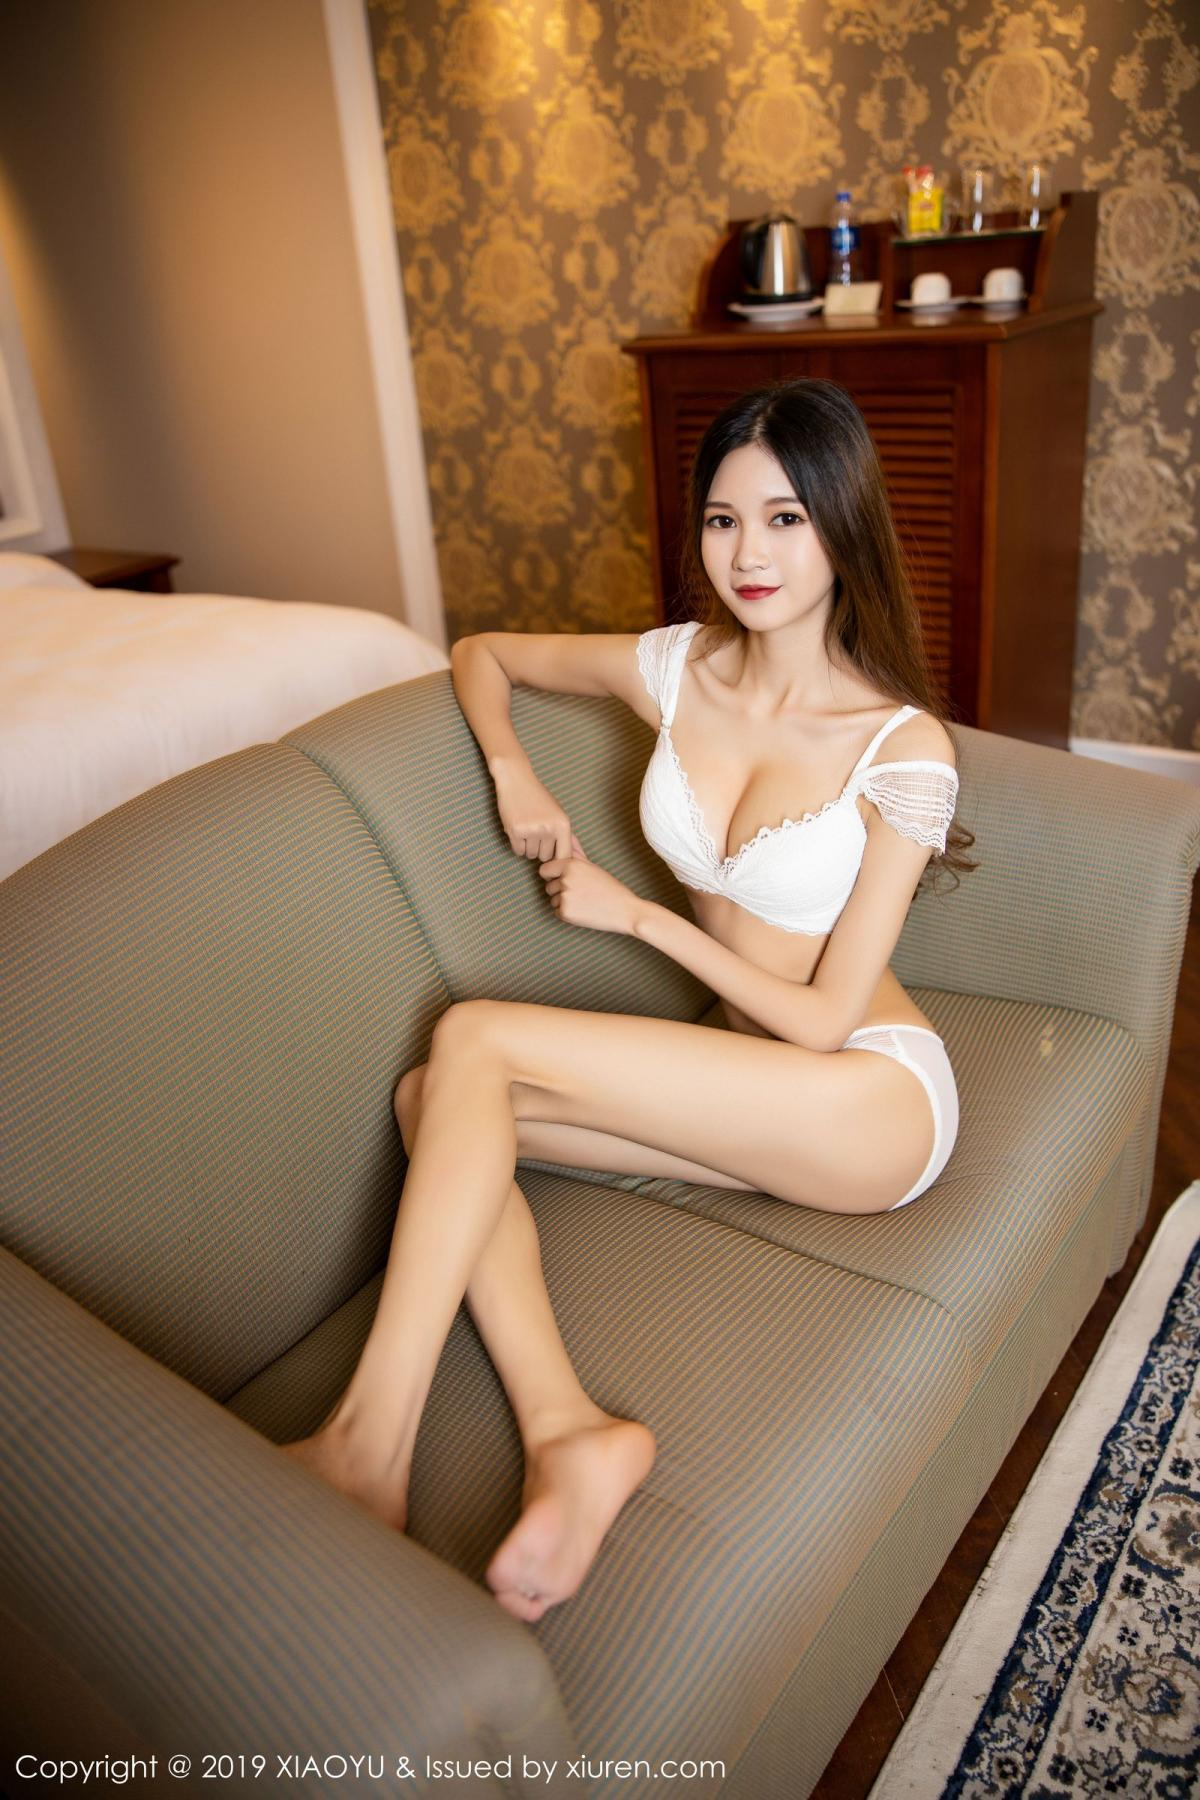 [XiaoYu] Vol.218 Cheng Cheng Cheng 41P, Cheng Cheng Cheng, Nurse, Tall, XiaoYu